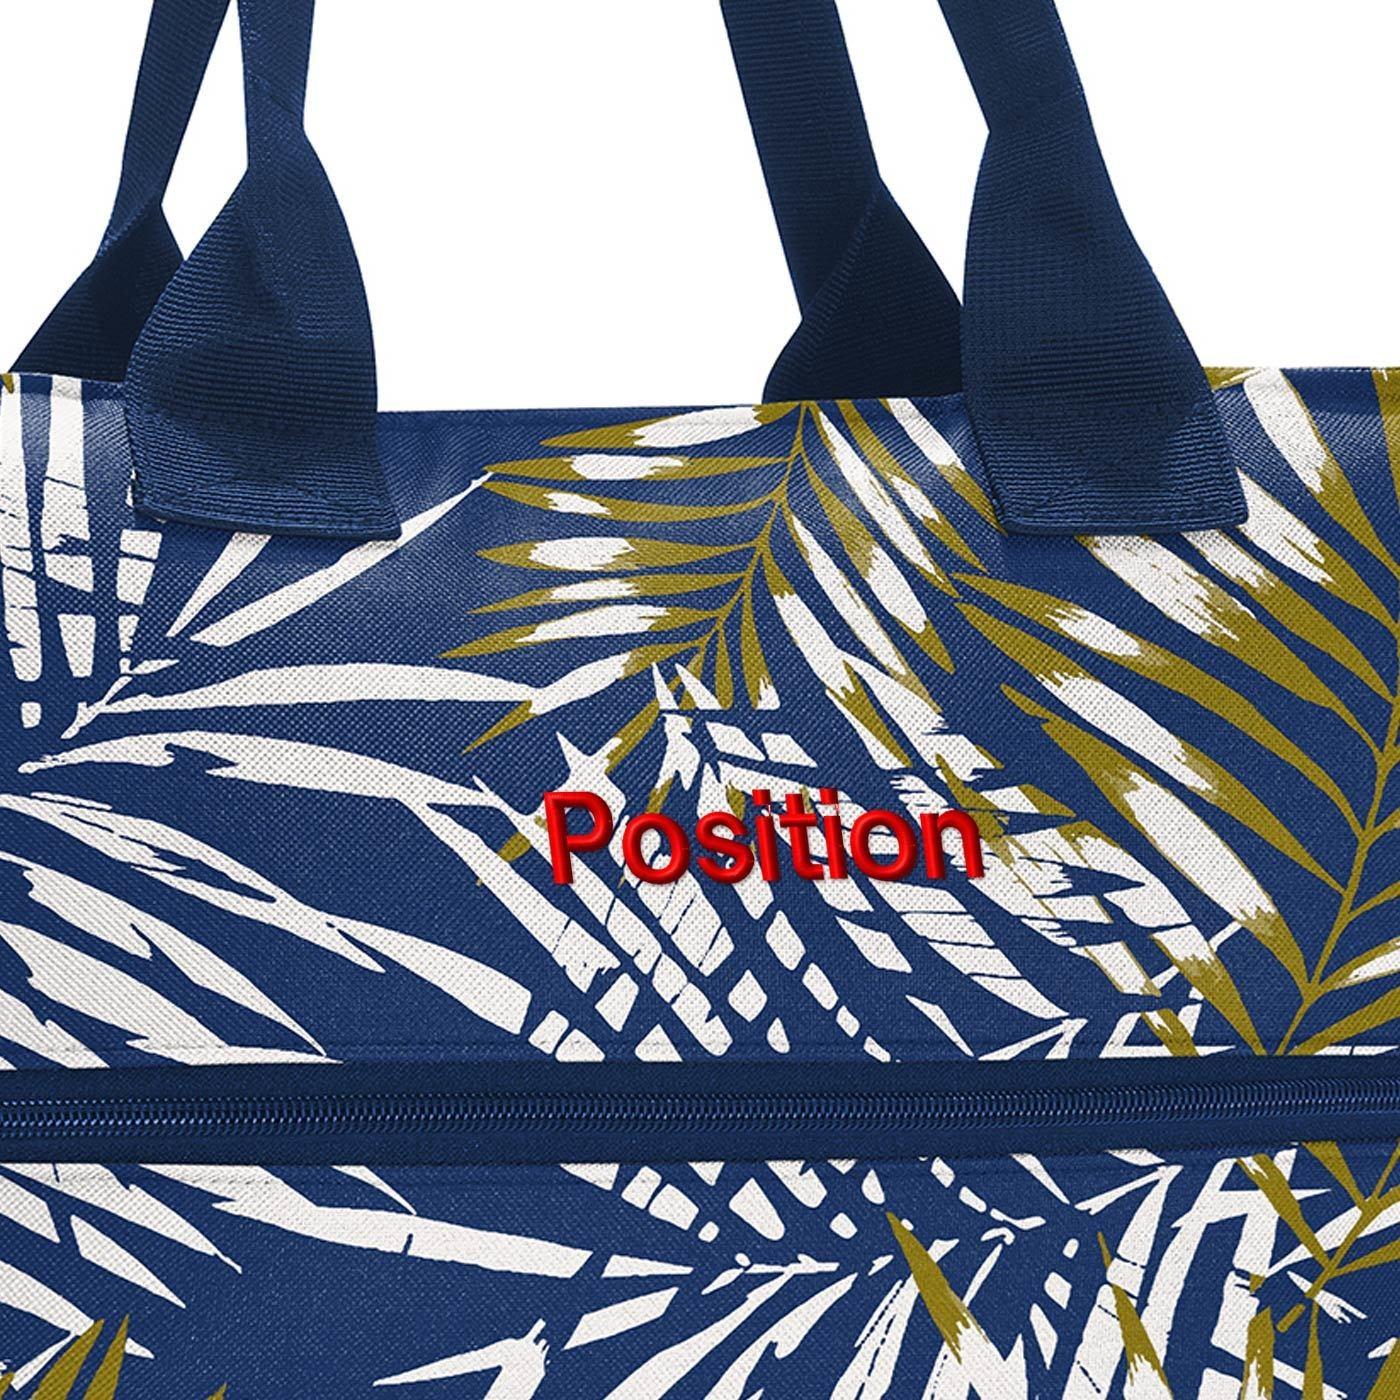 Chytrá taška přes rameno Shopper e1 jungle space blue_1